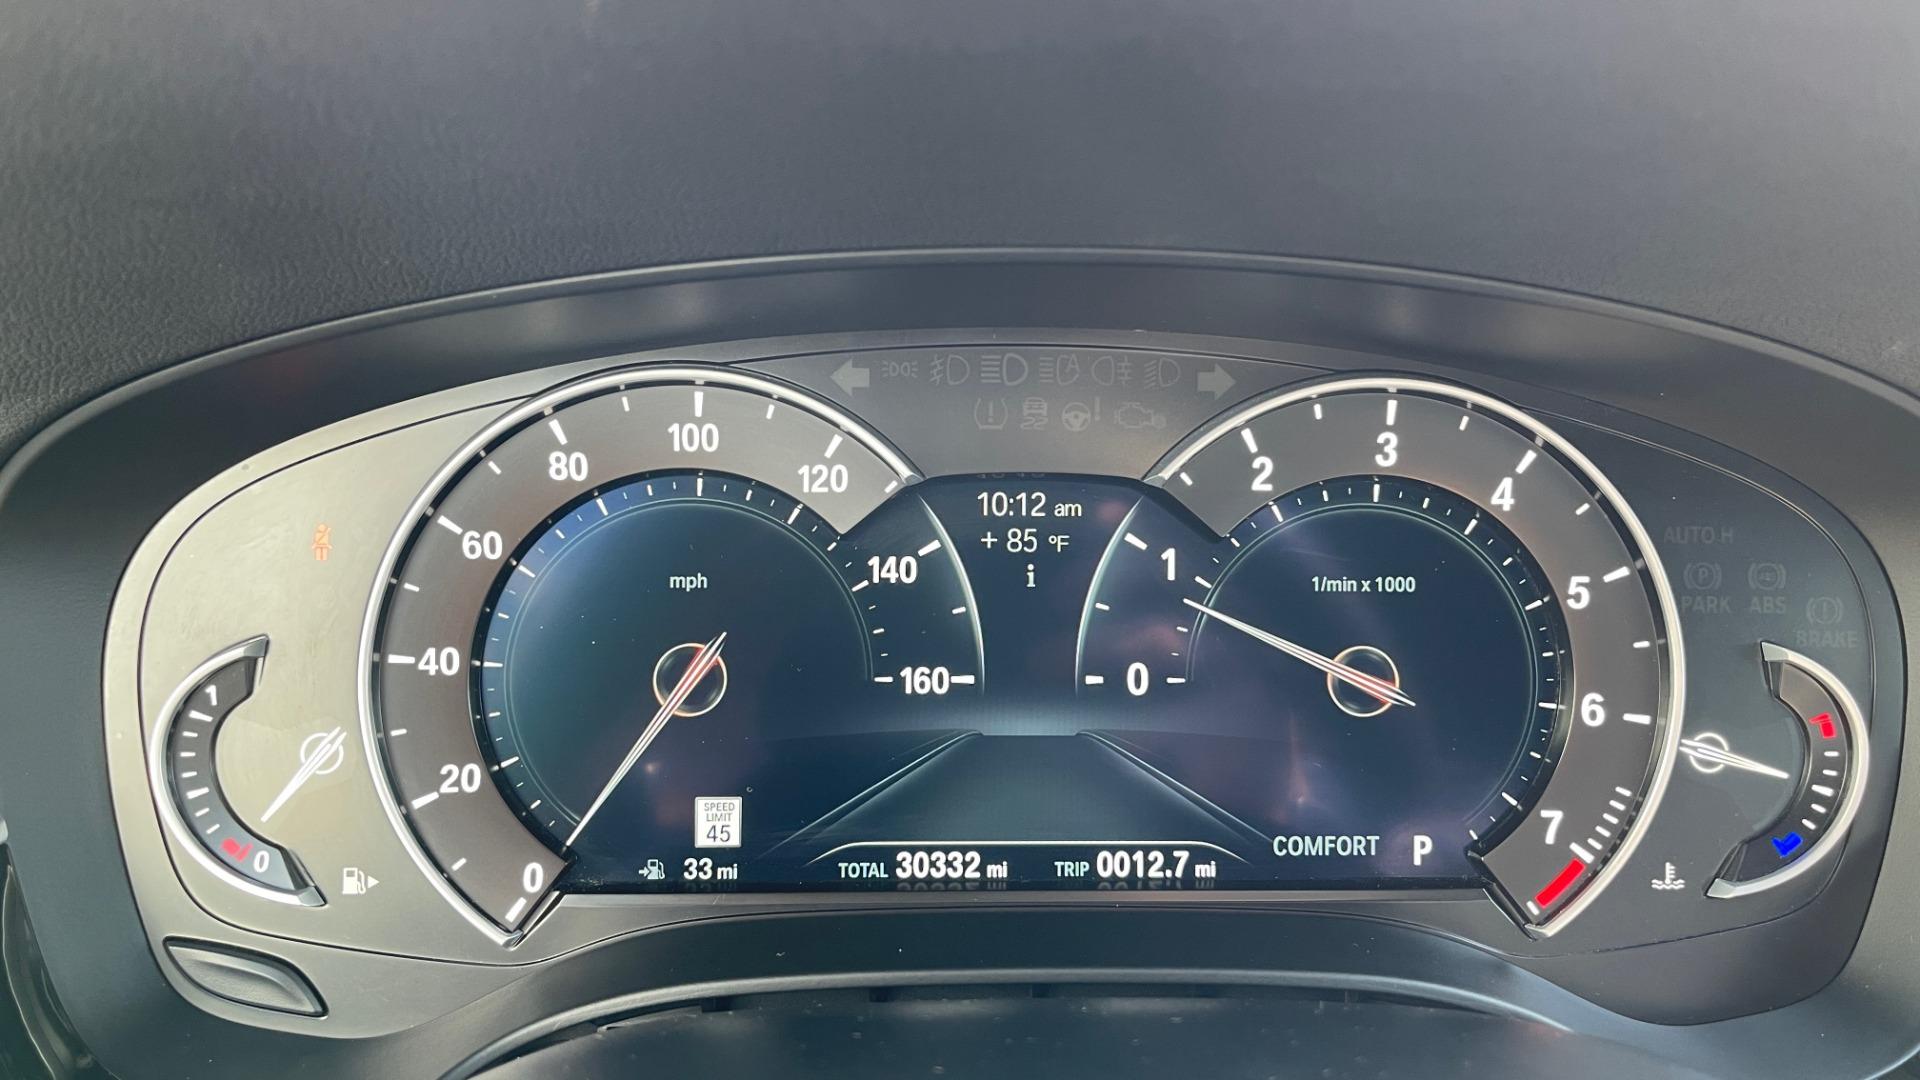 Used 2018 BMW 5 SERIES 540I XDRIVE M-SPORT / DRVR ASST / PDC / APPLE / HUD / H/K SND for sale $42,795 at Formula Imports in Charlotte NC 28227 35